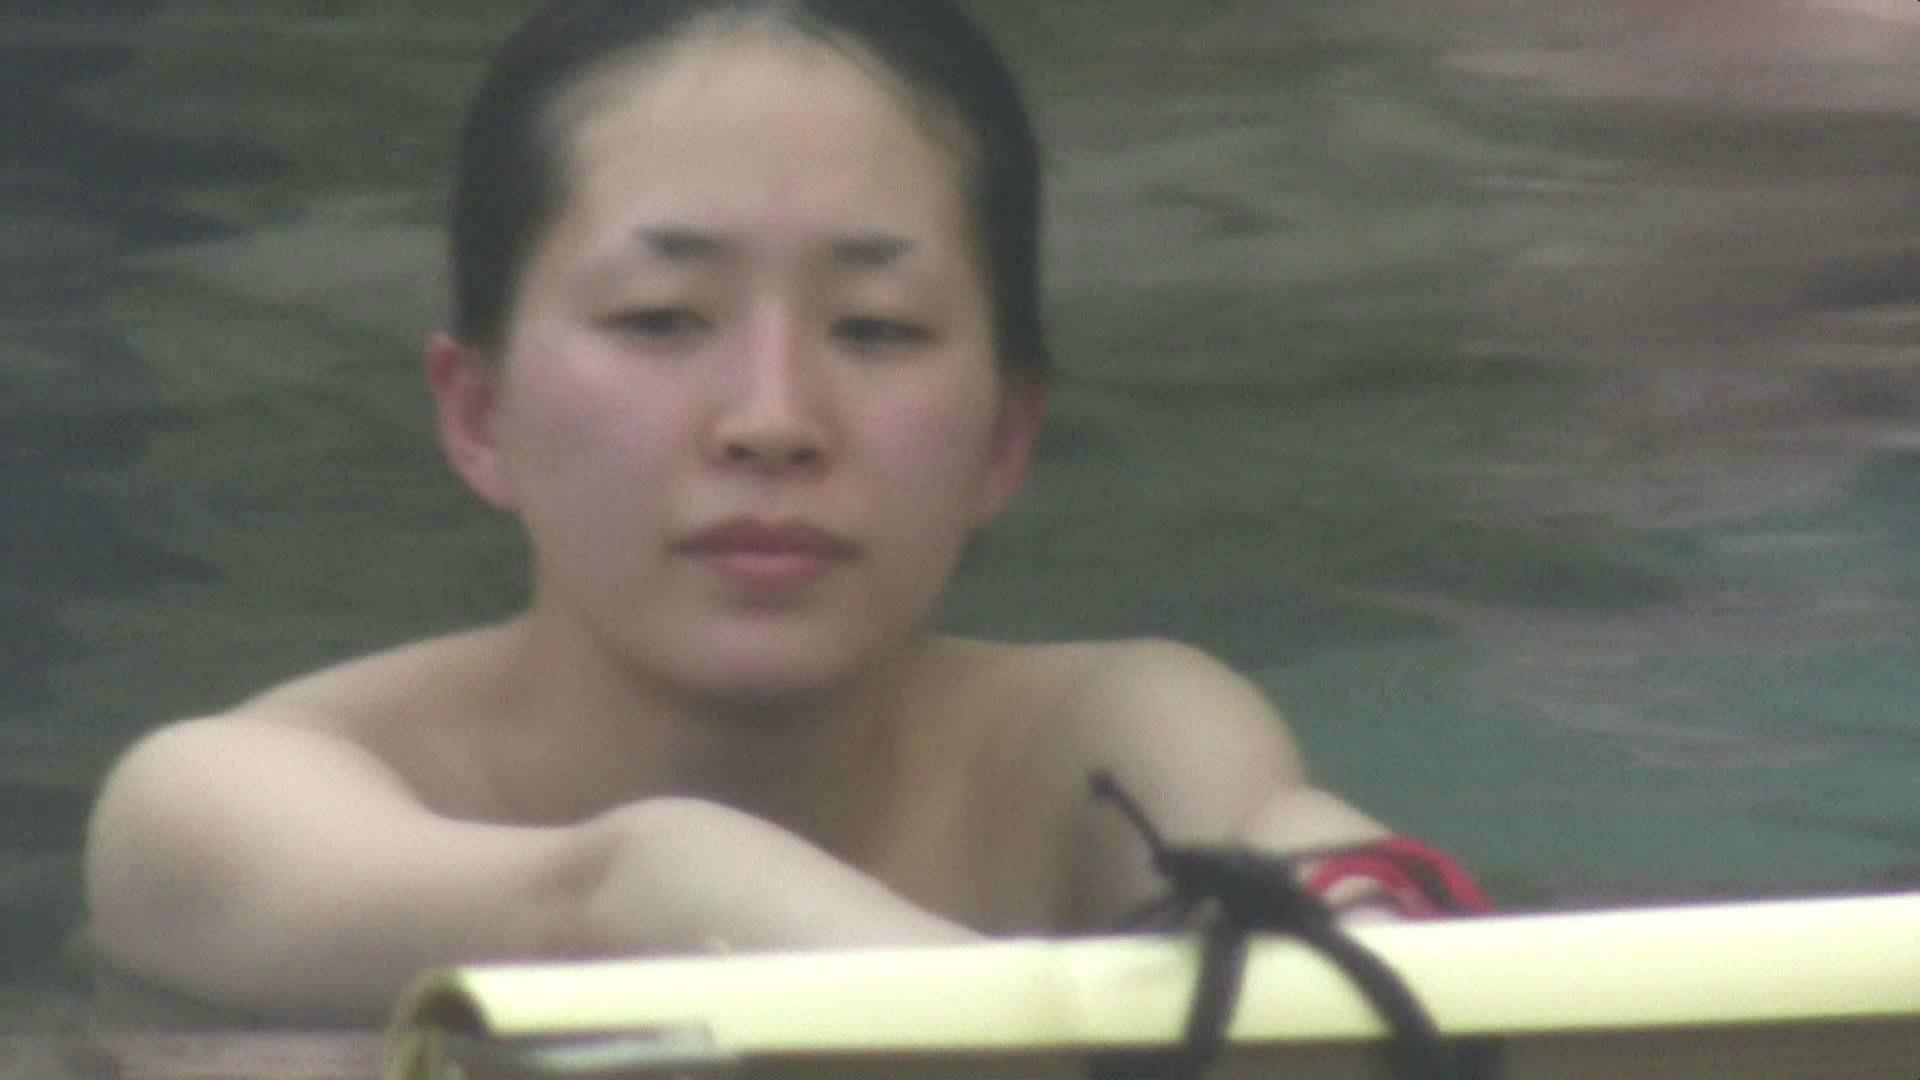 Aquaな露天風呂Vol.583 美しいOLの裸体 すけべAV動画紹介 103pic 59